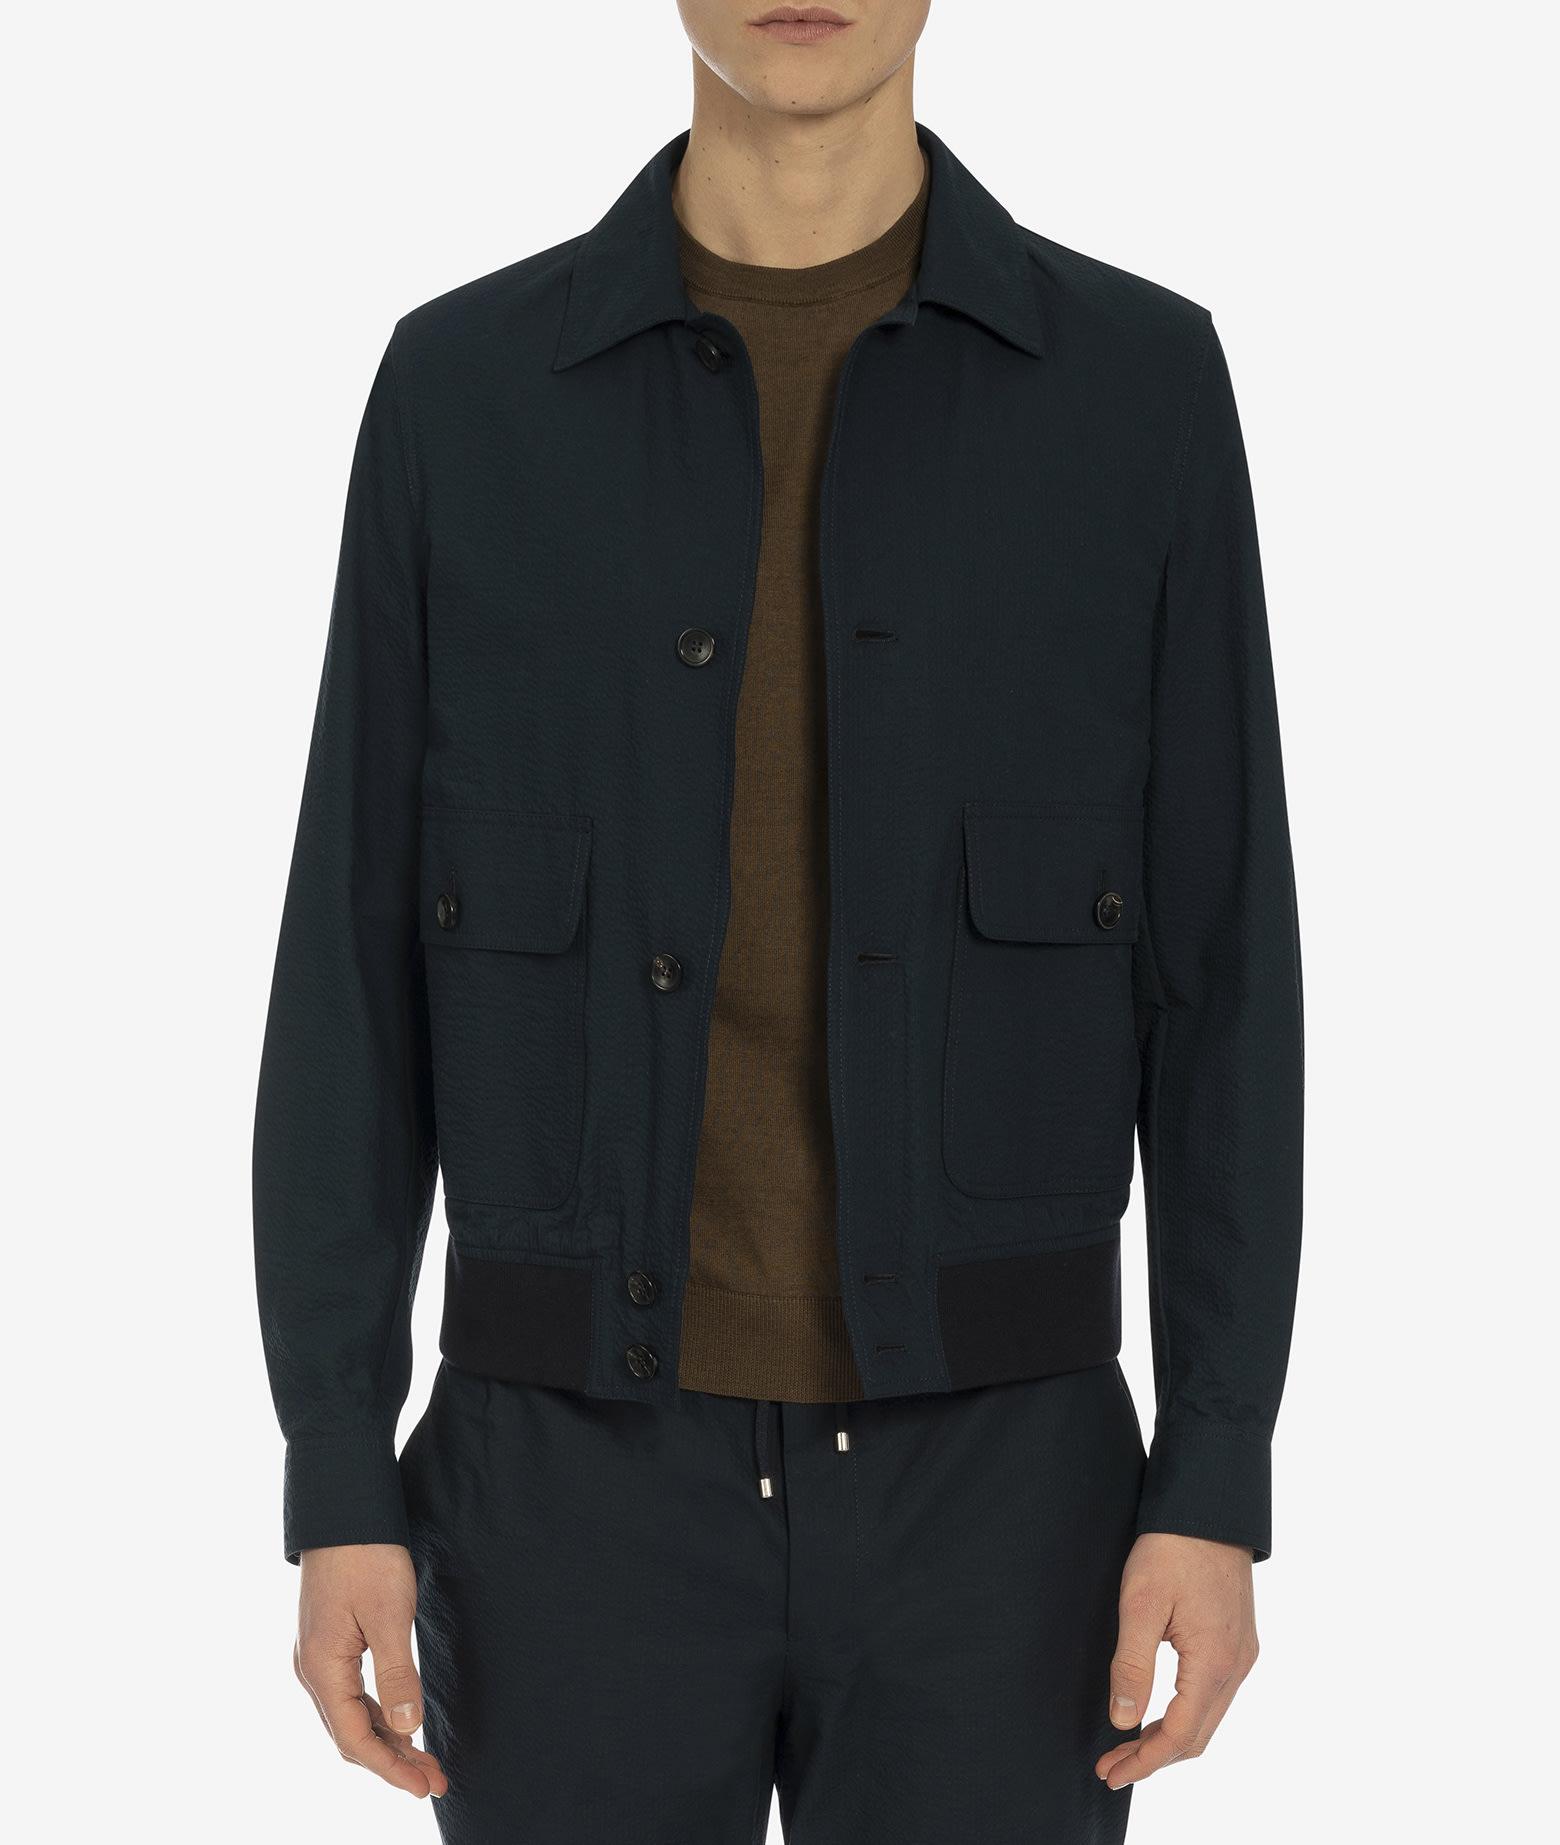 Jacket sempione